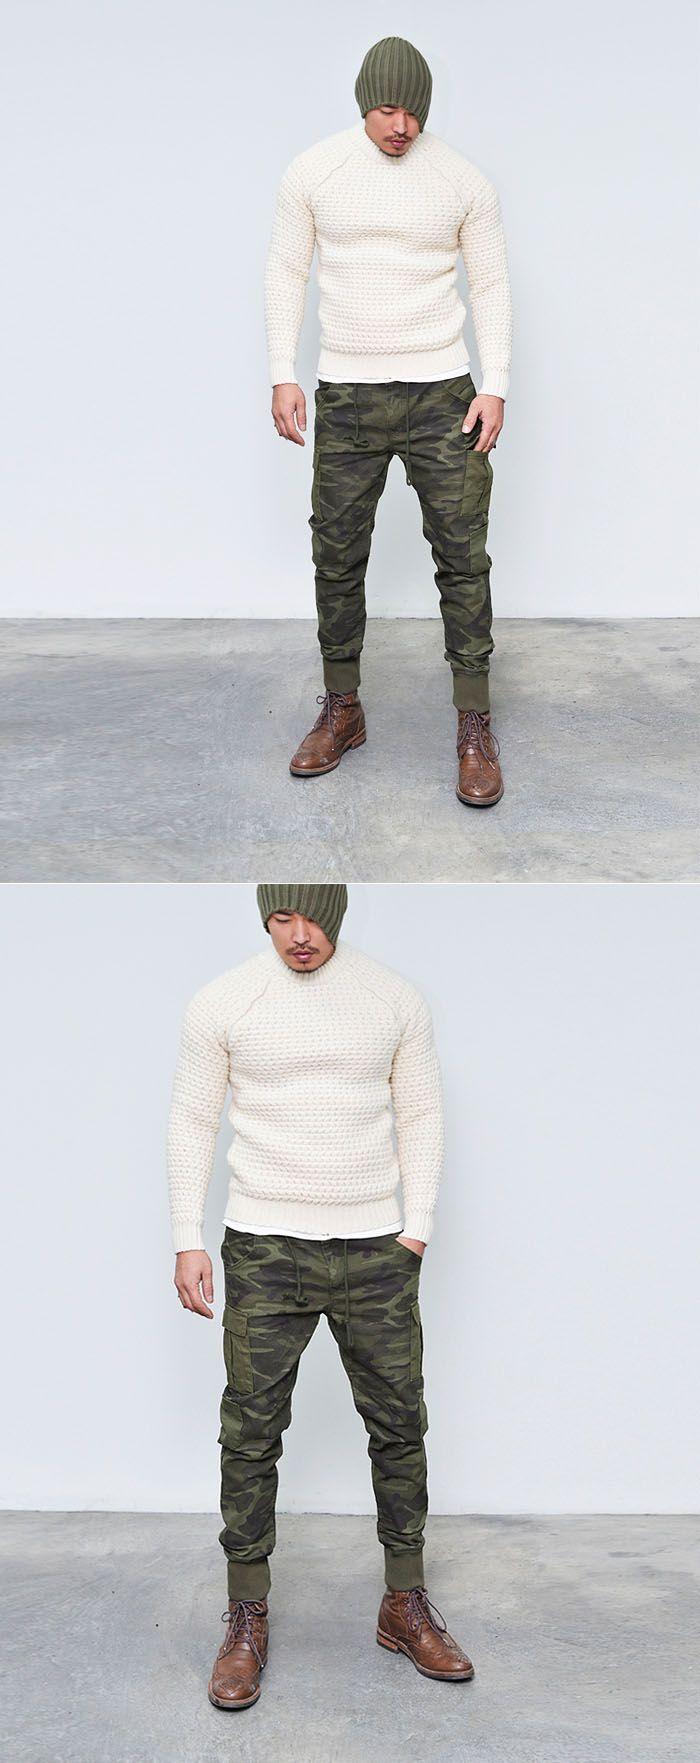 Must-have Camouflage Cargo Drop Jogger-Pants 153 - GUYLOOK